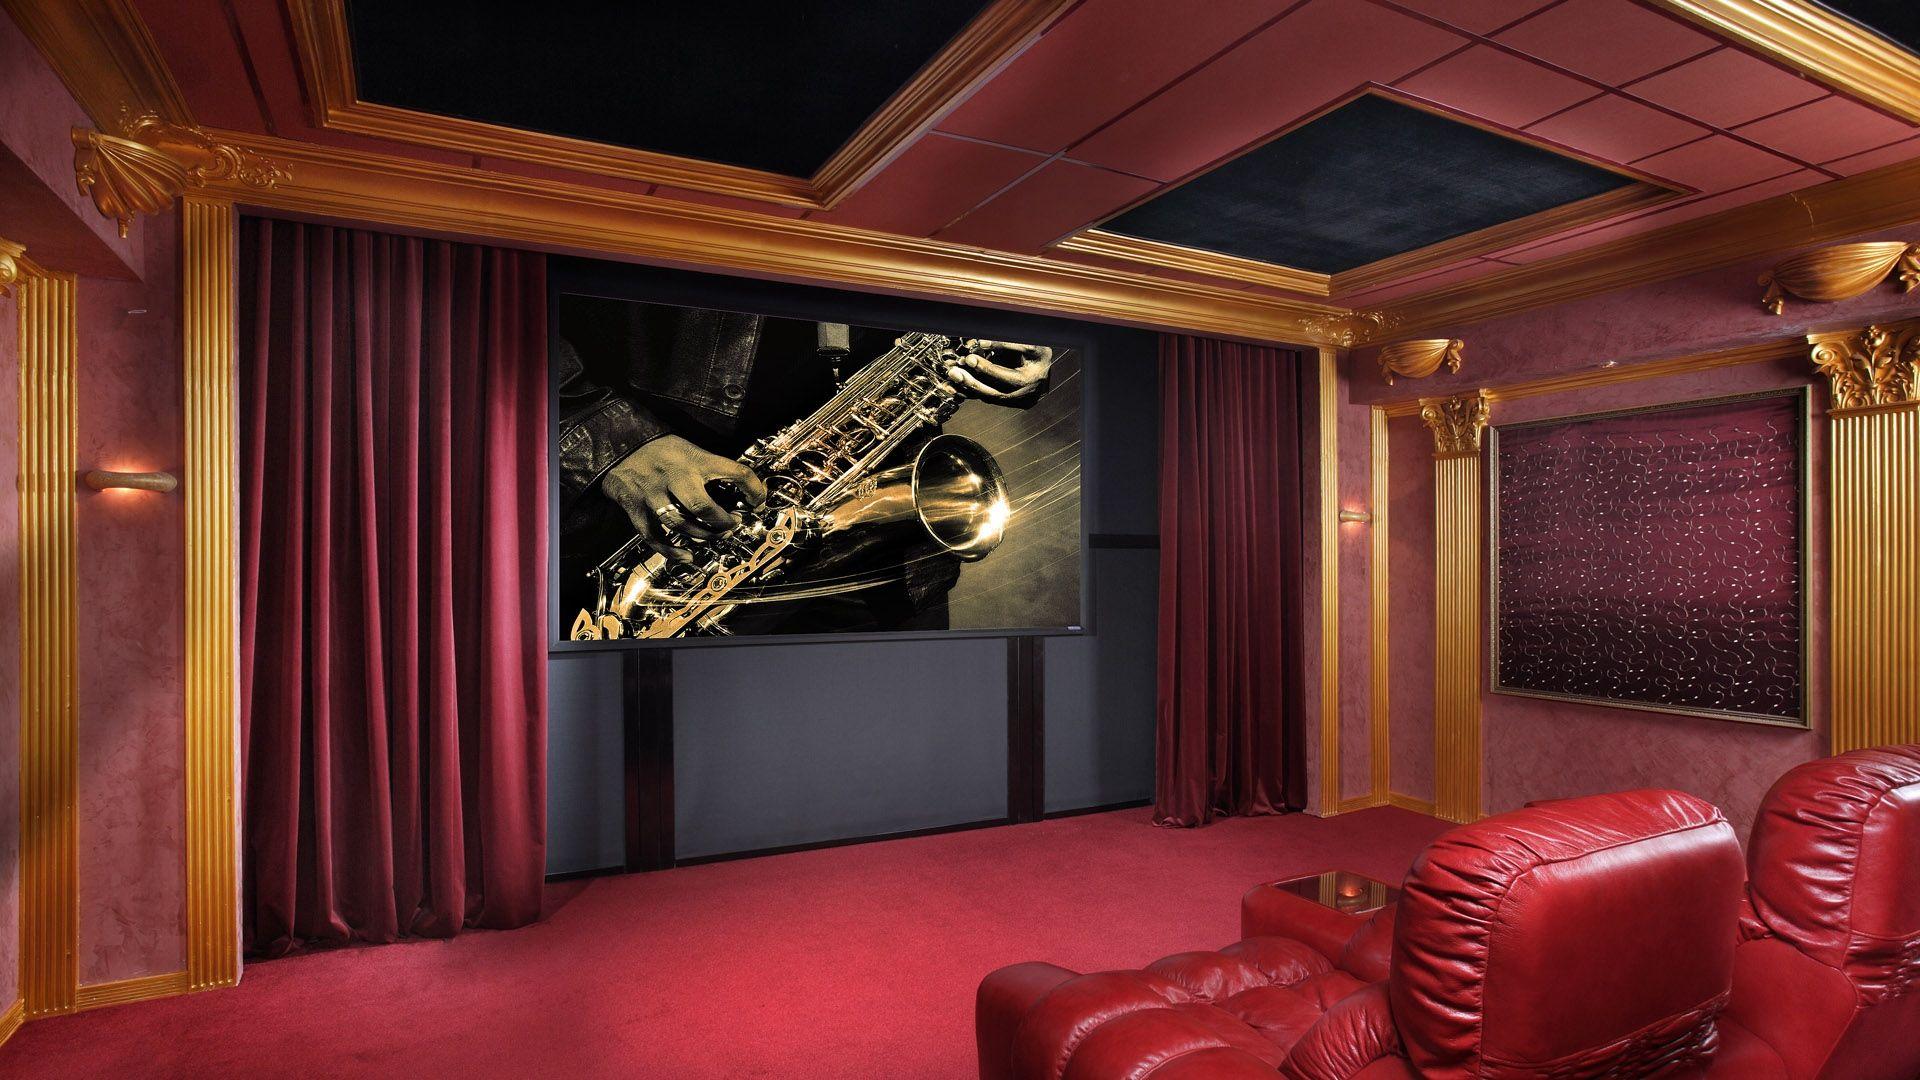 Movie Theater vertical wallpaper hd